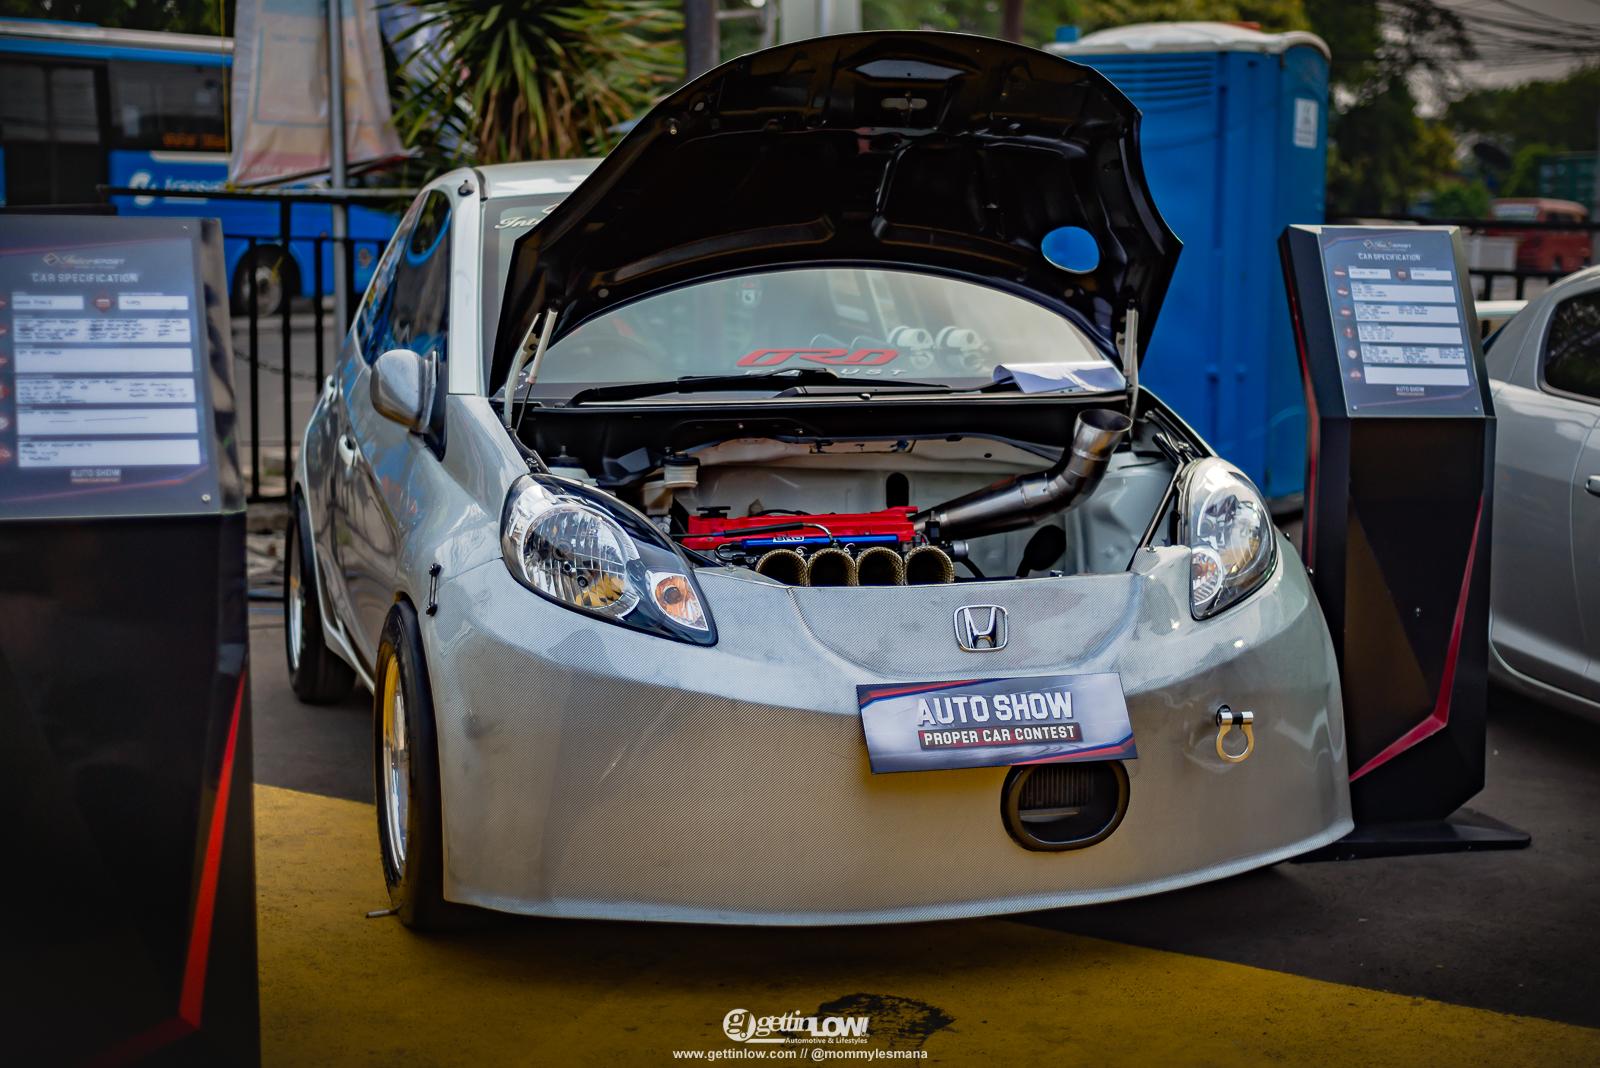 INTERSPORT AUTOSHOW PROPER CAR CONTEST 2018 GRAND CAKUNG JAKARTA